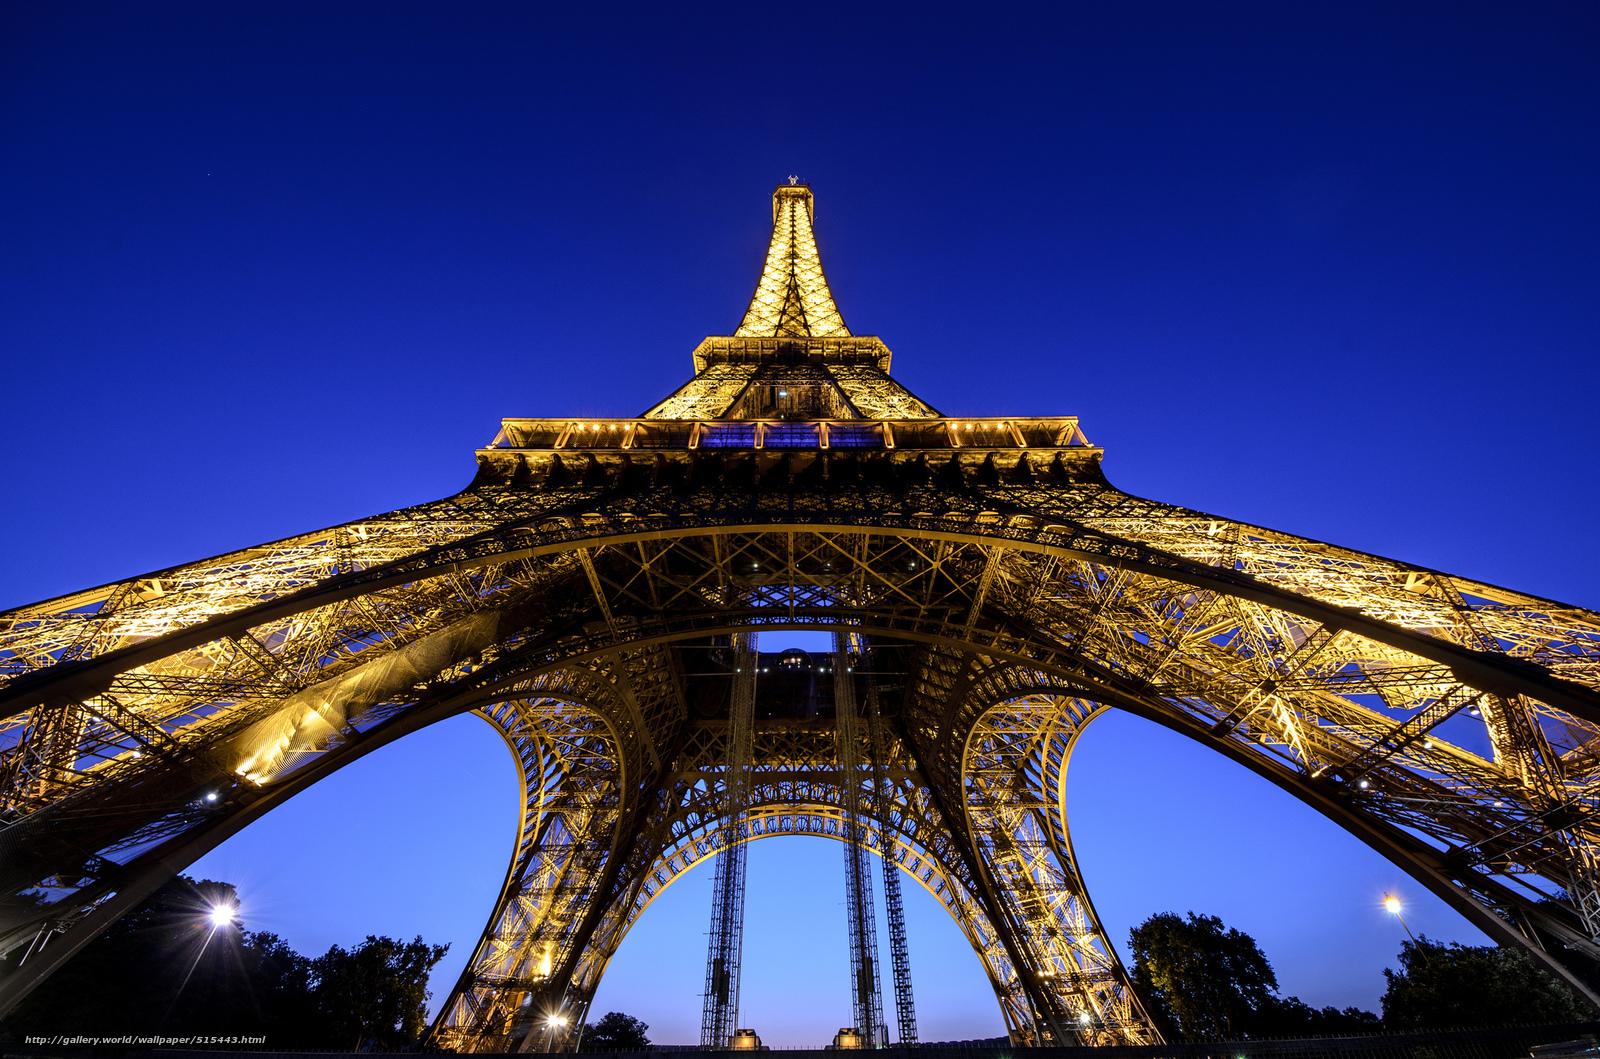 Download Wallpaper Eiffel Tower Paris Lighting Evening Free Desktop Wallpaper In The Resolution 2048x1356 Picture 515443